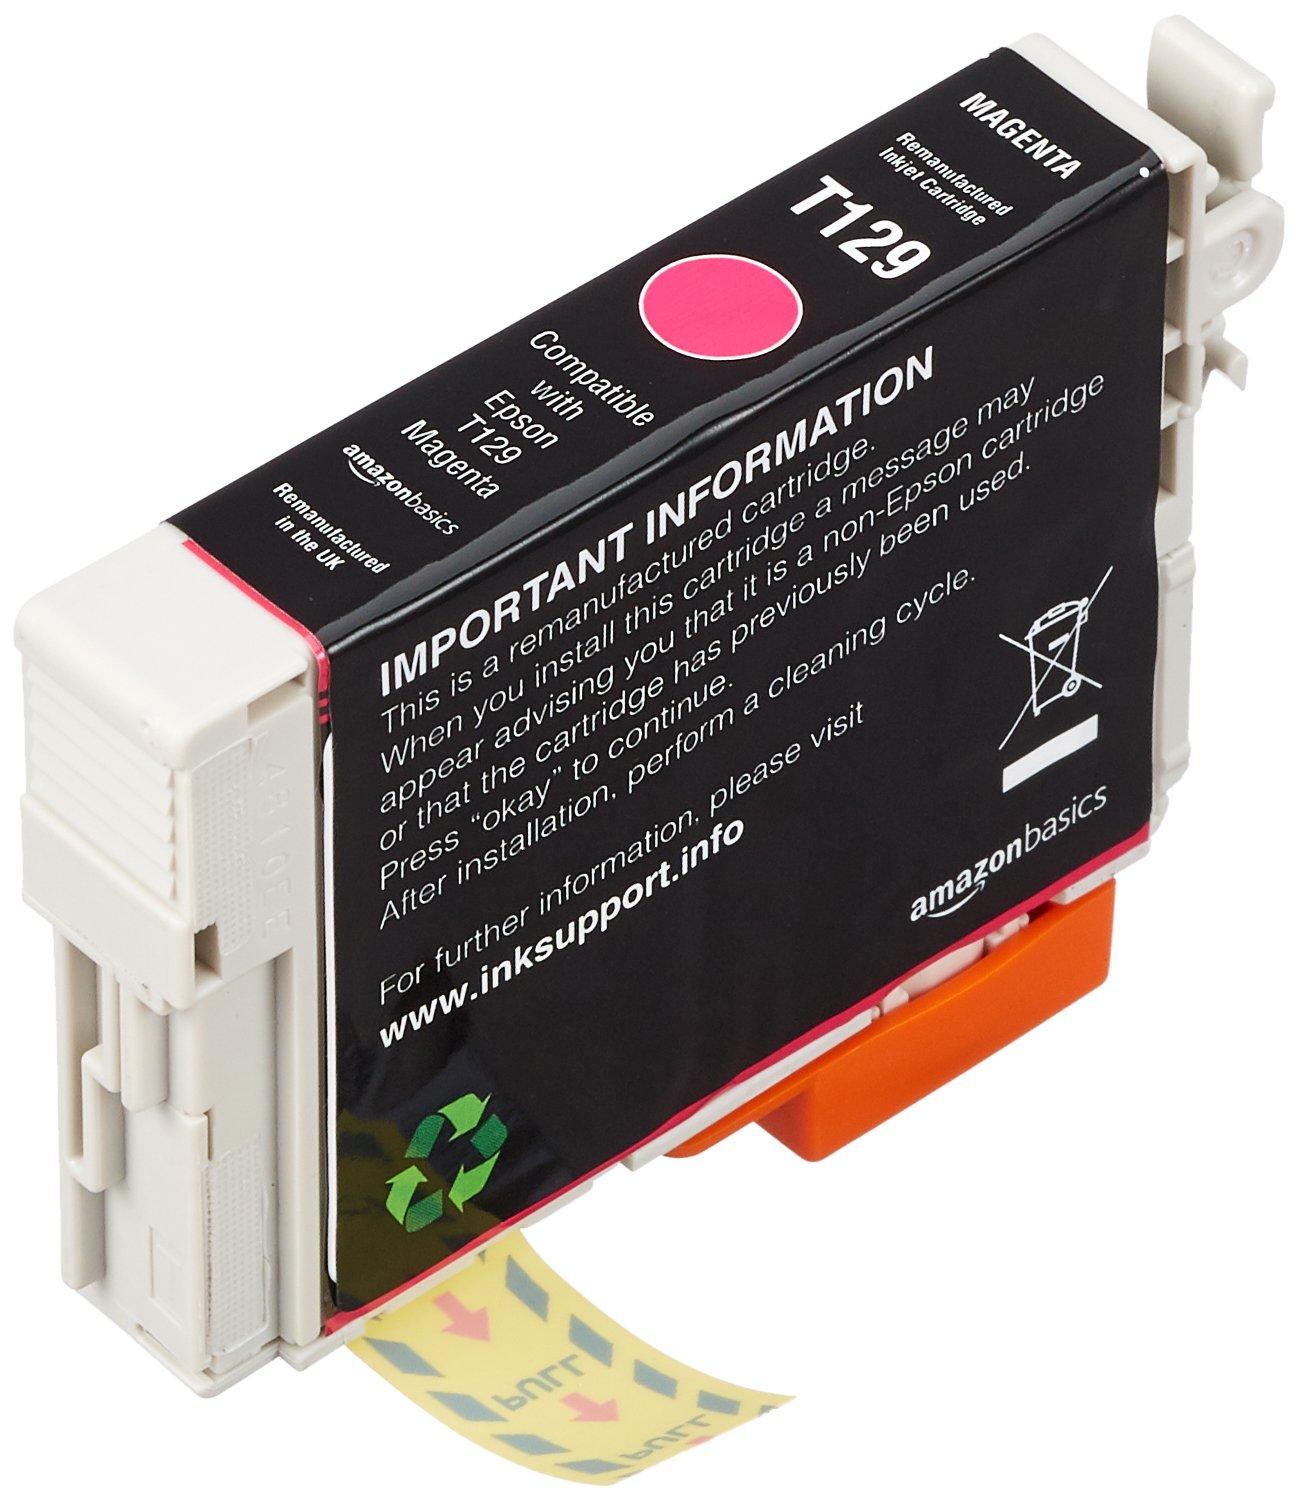 AmazonBasics-Wiederaufbereitete-Tintenpatrone-fr-Epson-Apple-T1295